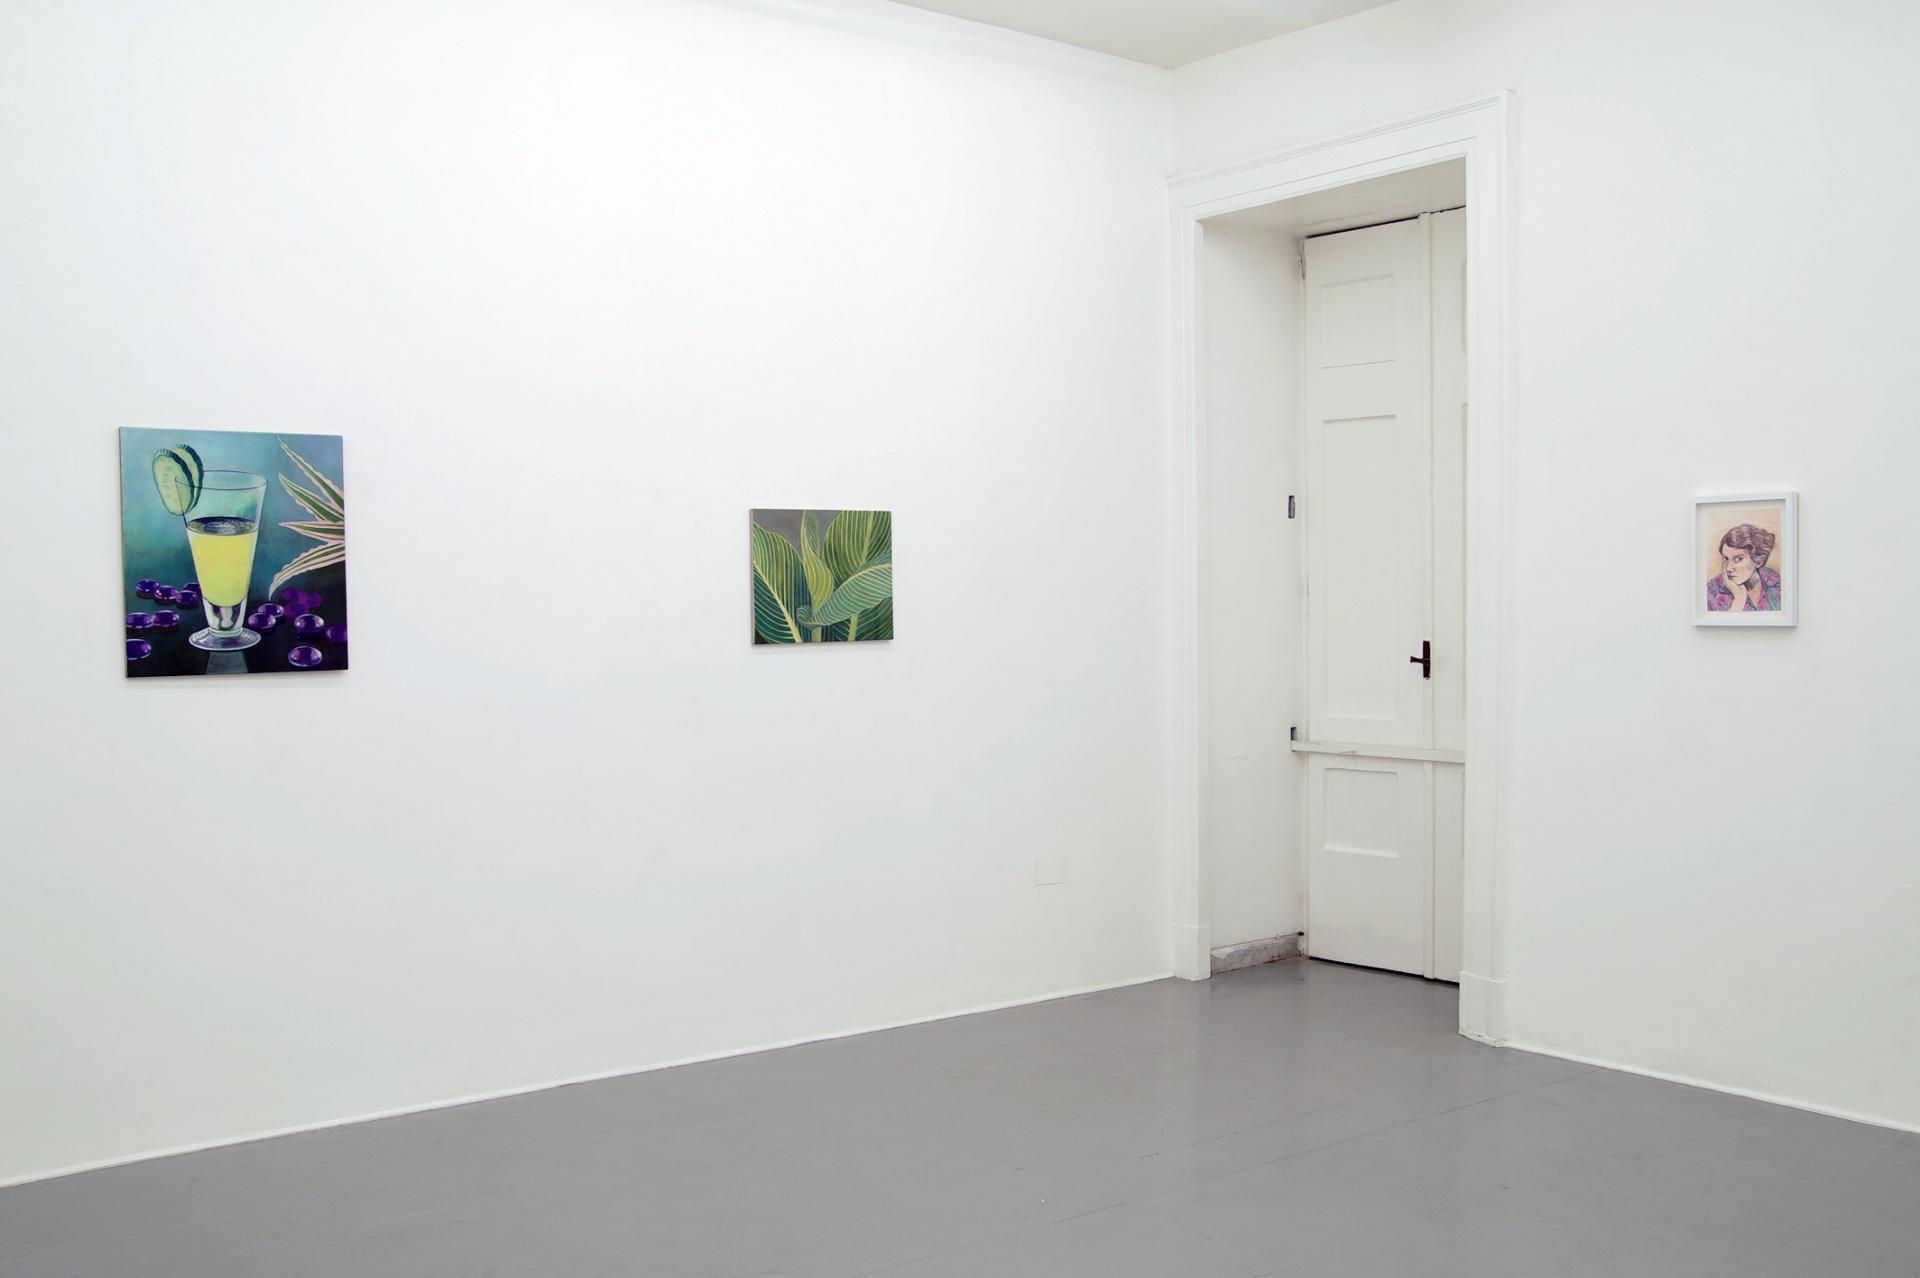 Galleria Fonti BIRGIT MEGERLE – Airs and Graces